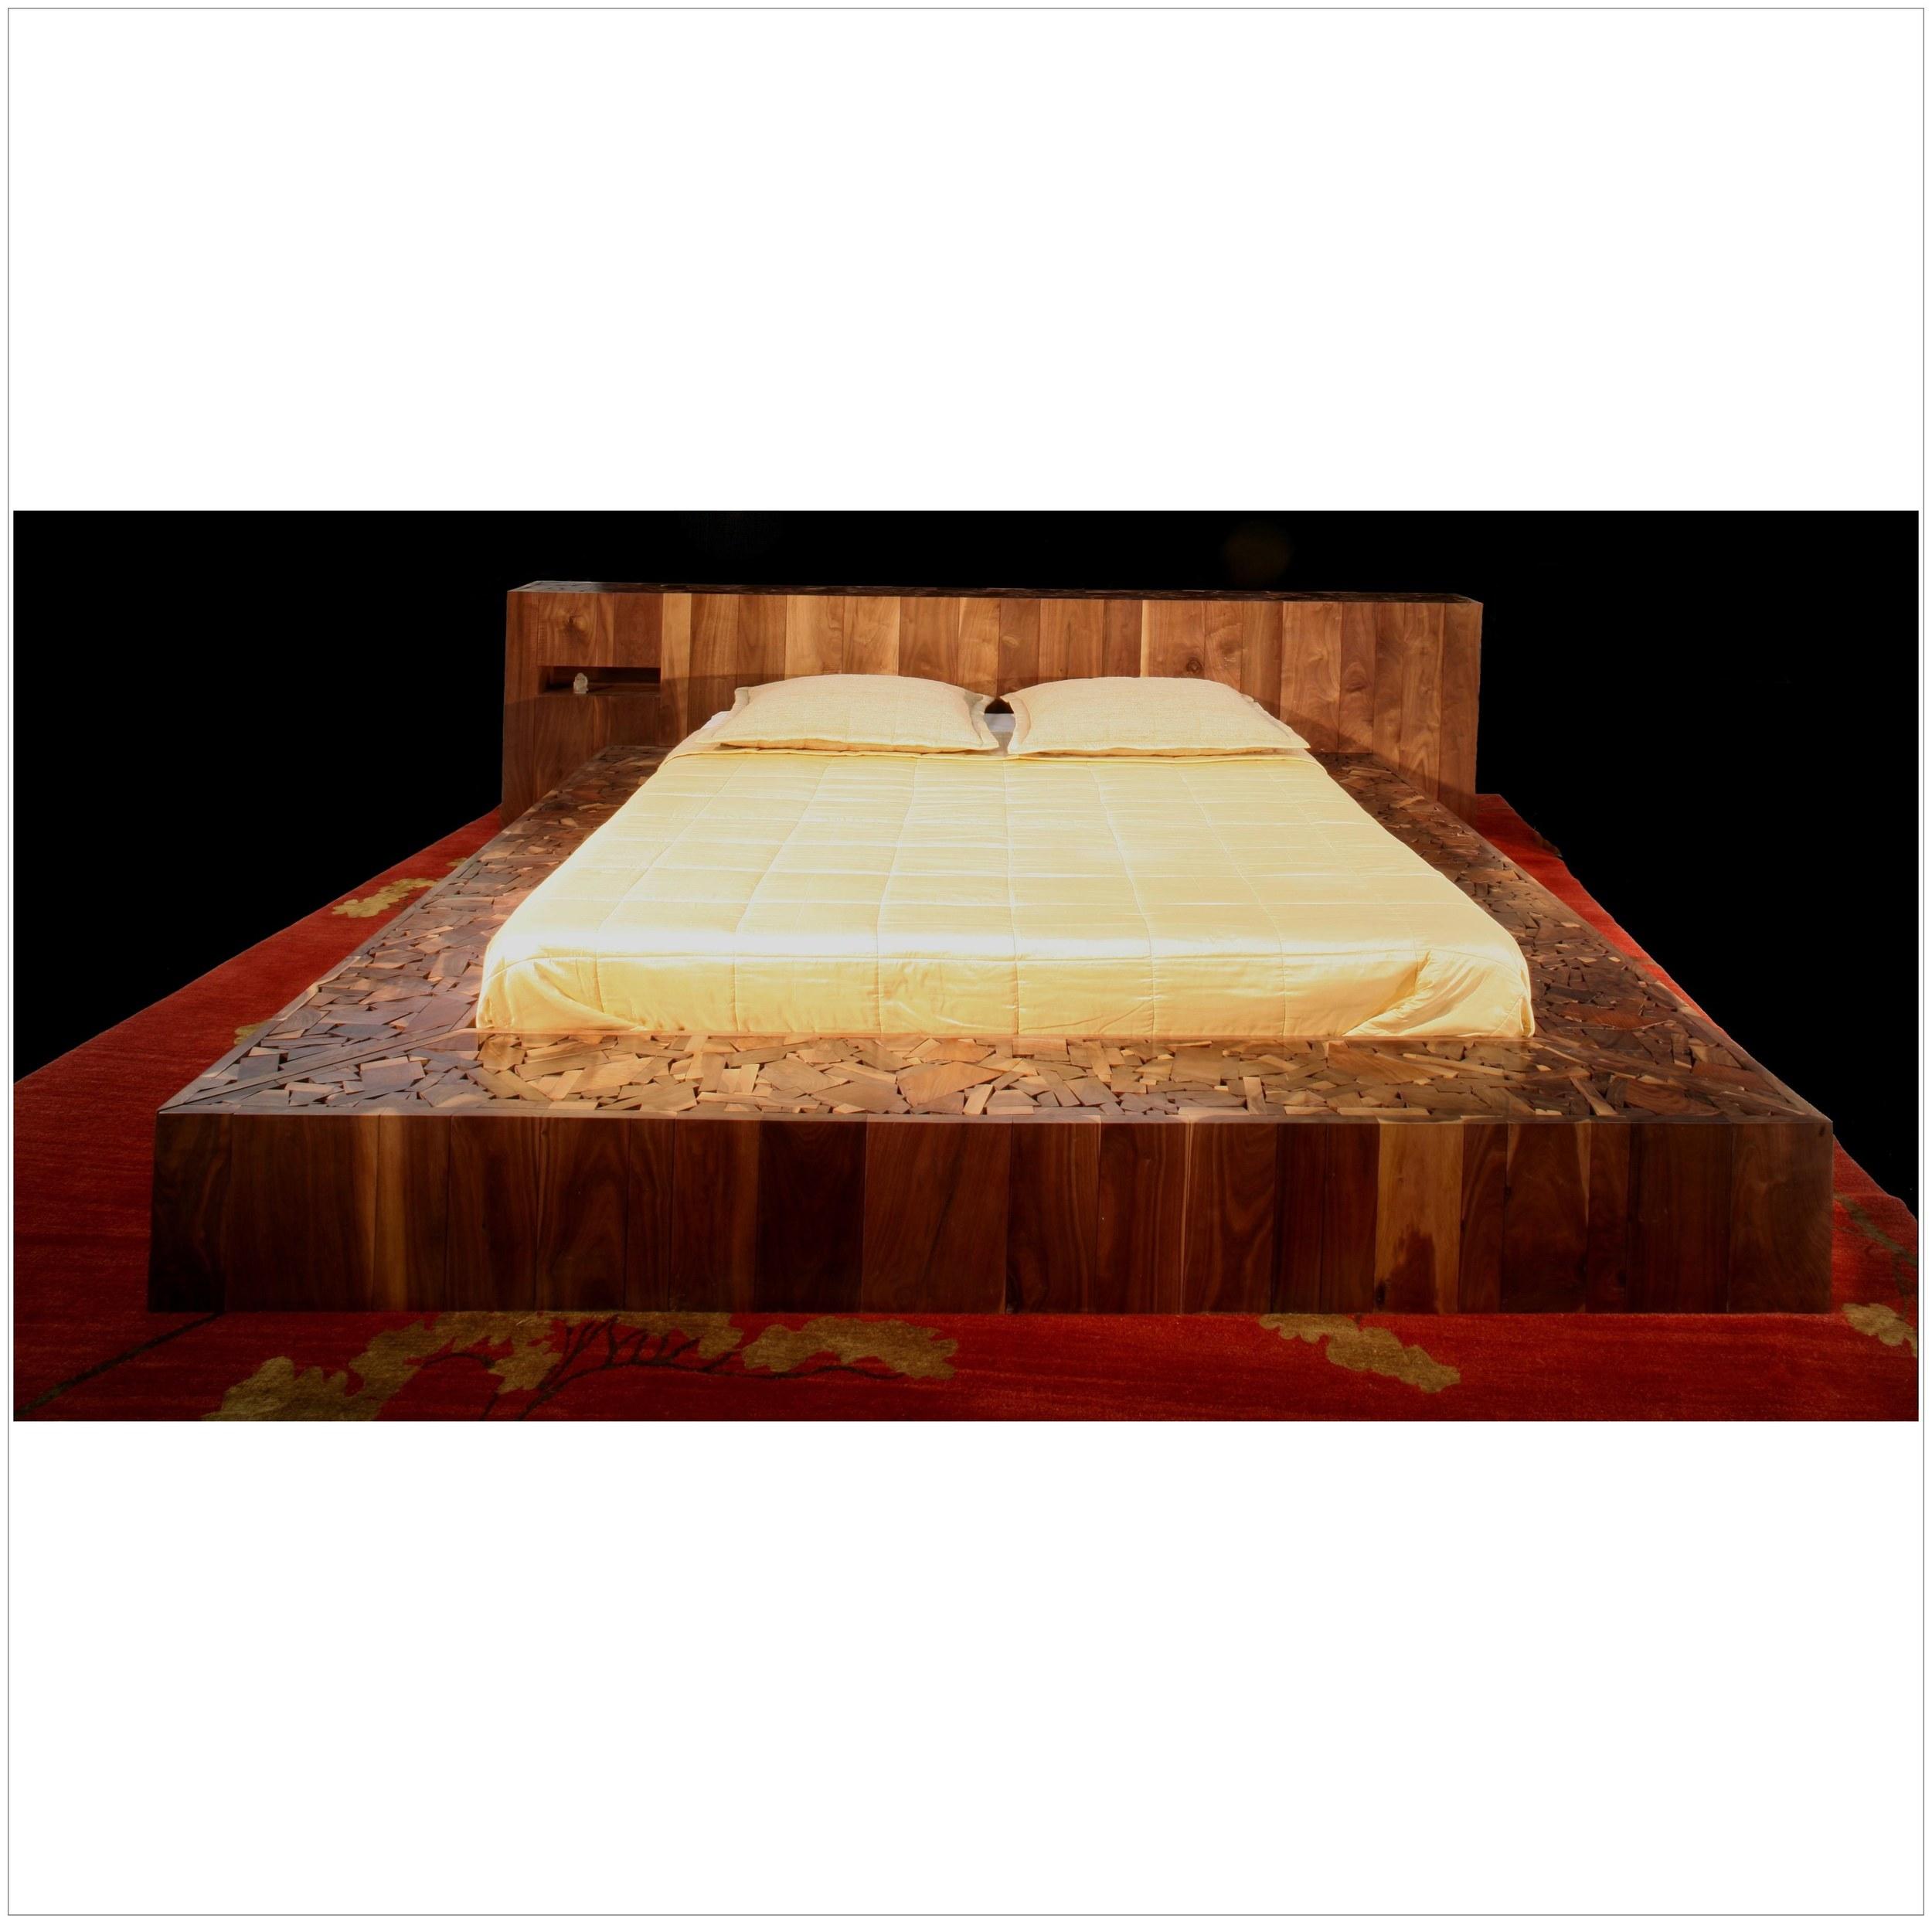 Bed print final 2 (2)web.jpg